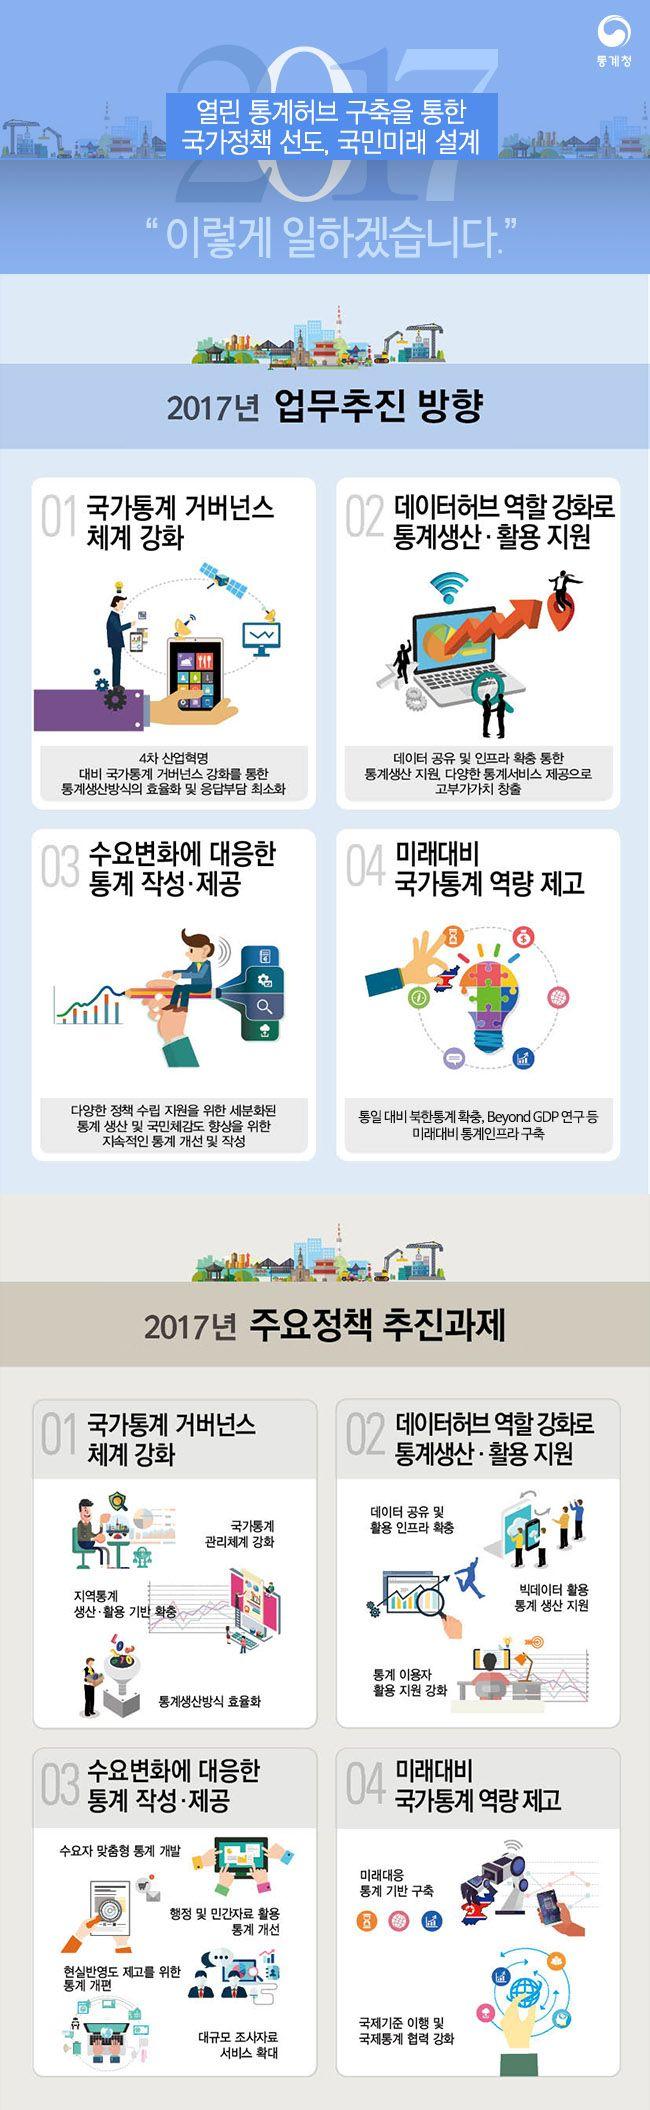 [Infographic]'2017년 통계청 업무계획'에 관한 인포그래픽